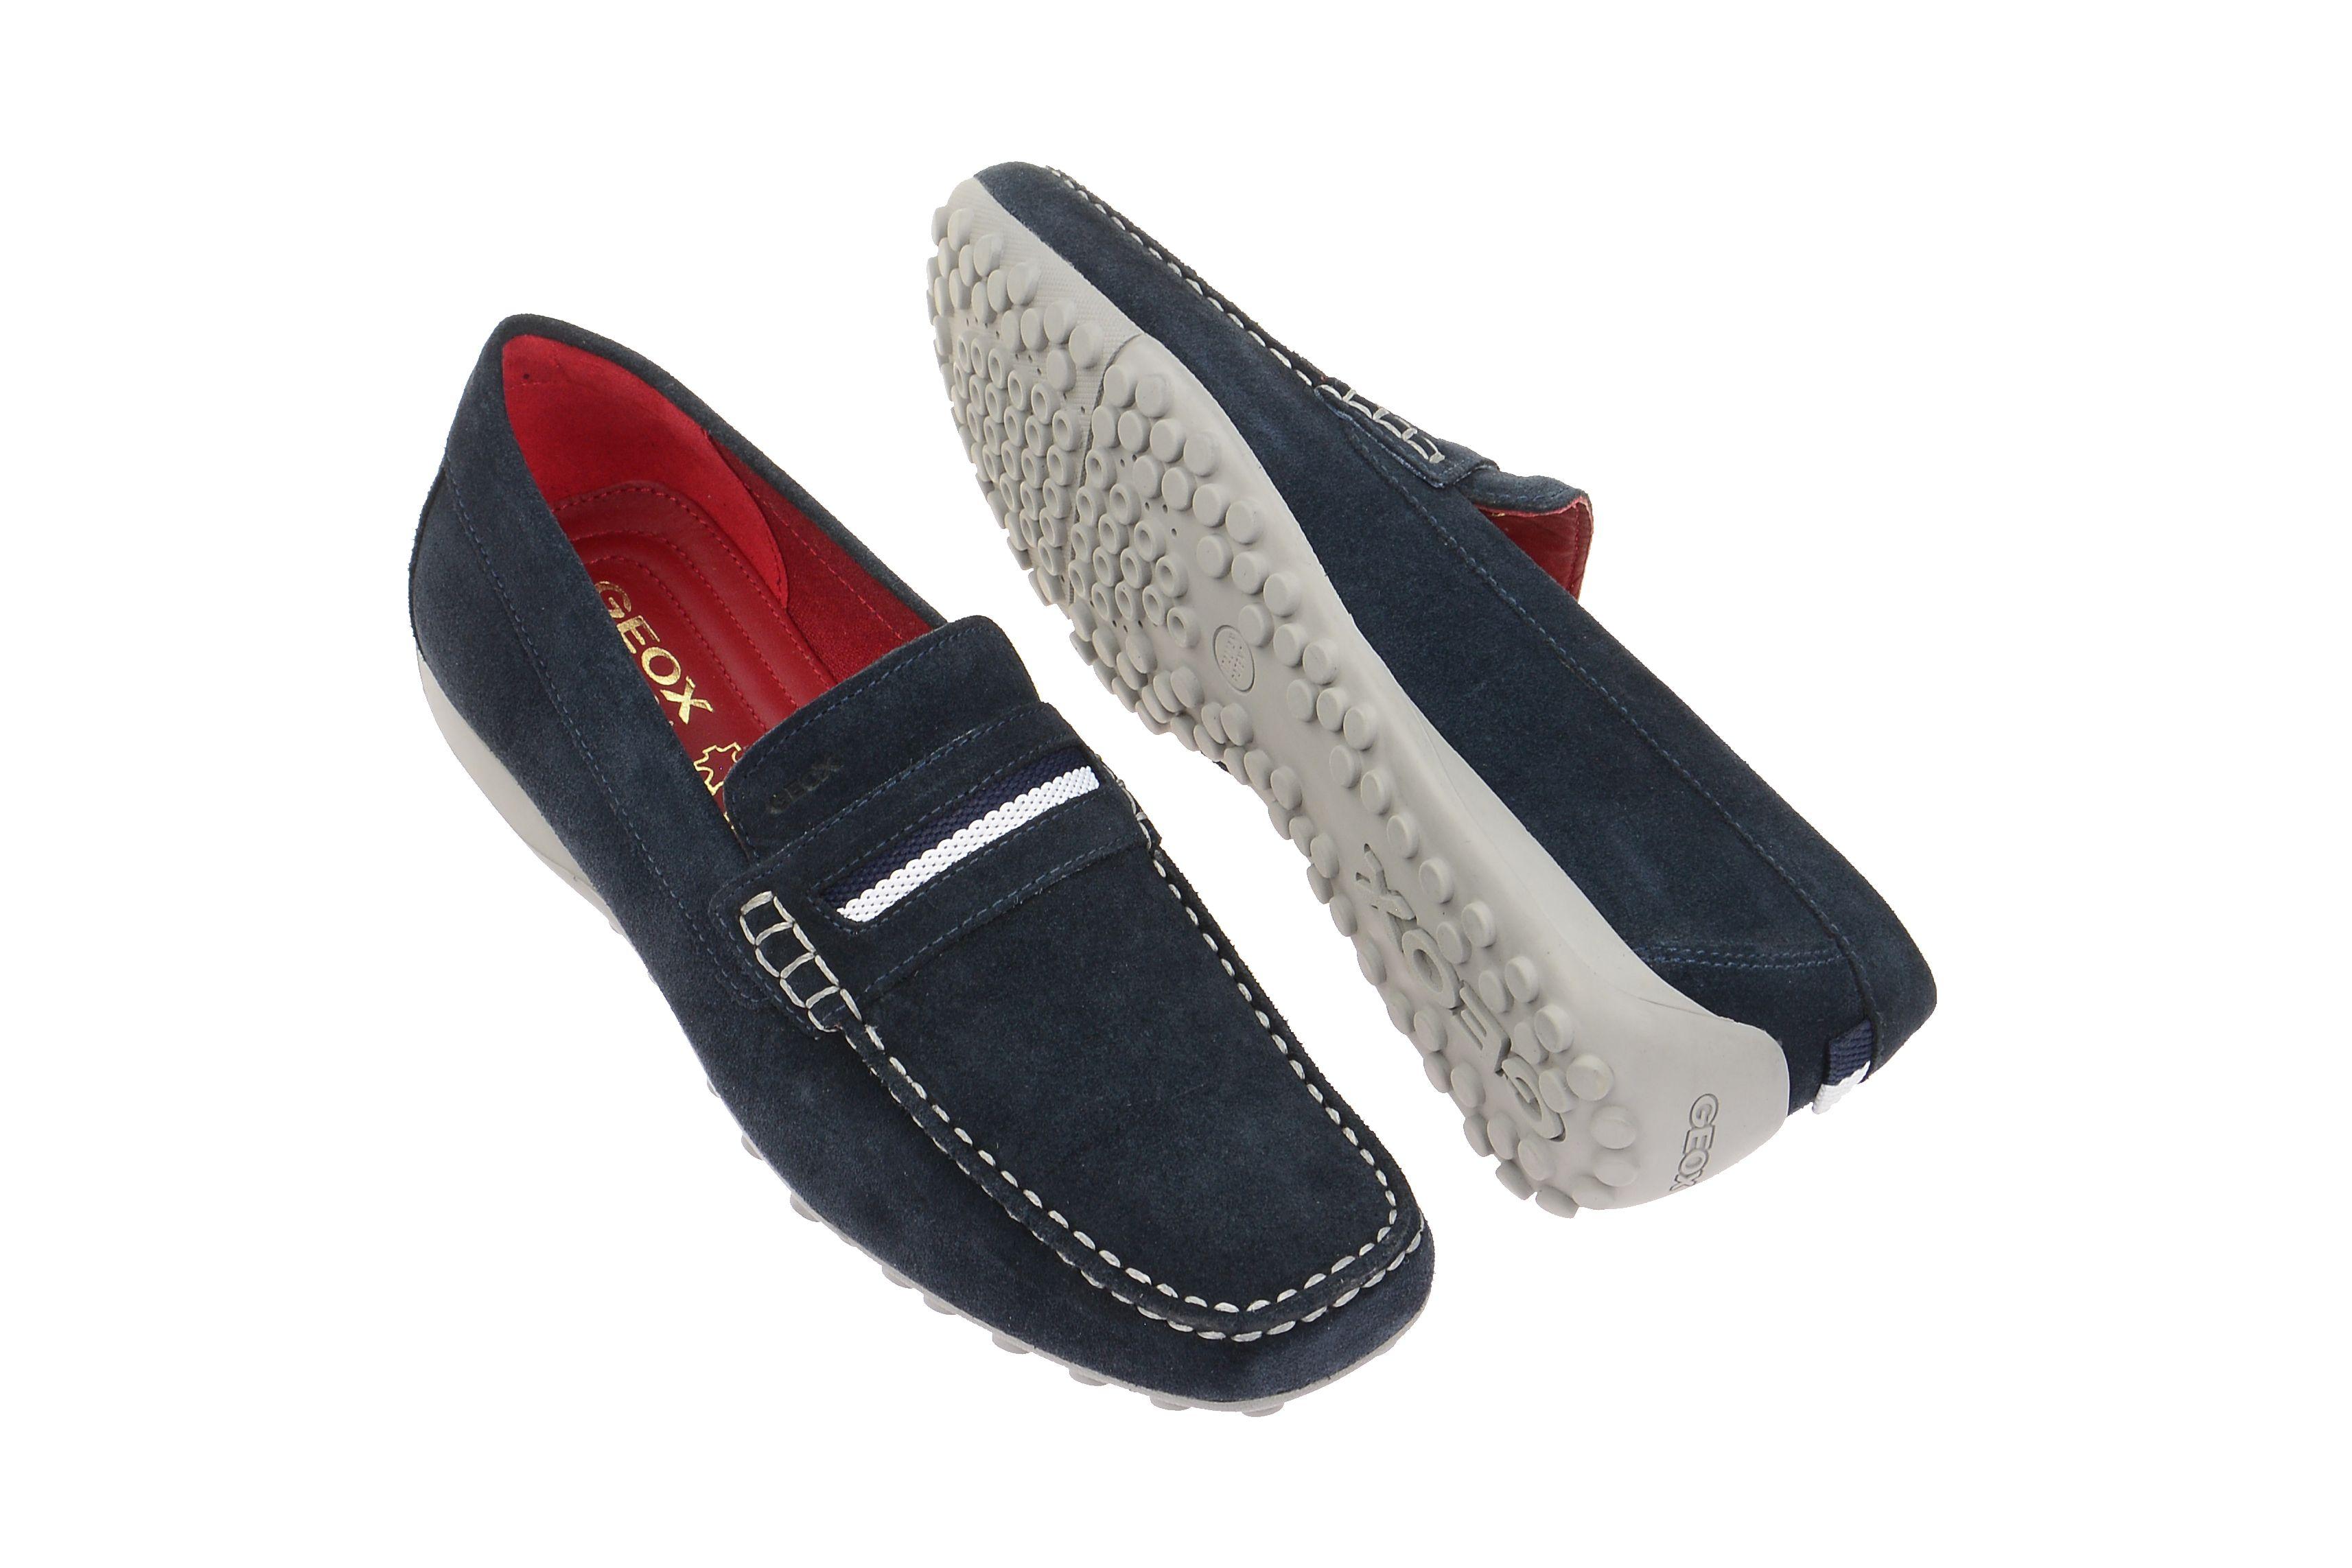 Geox NEBULA Schuhe Sandale für Herren in dunkel blau